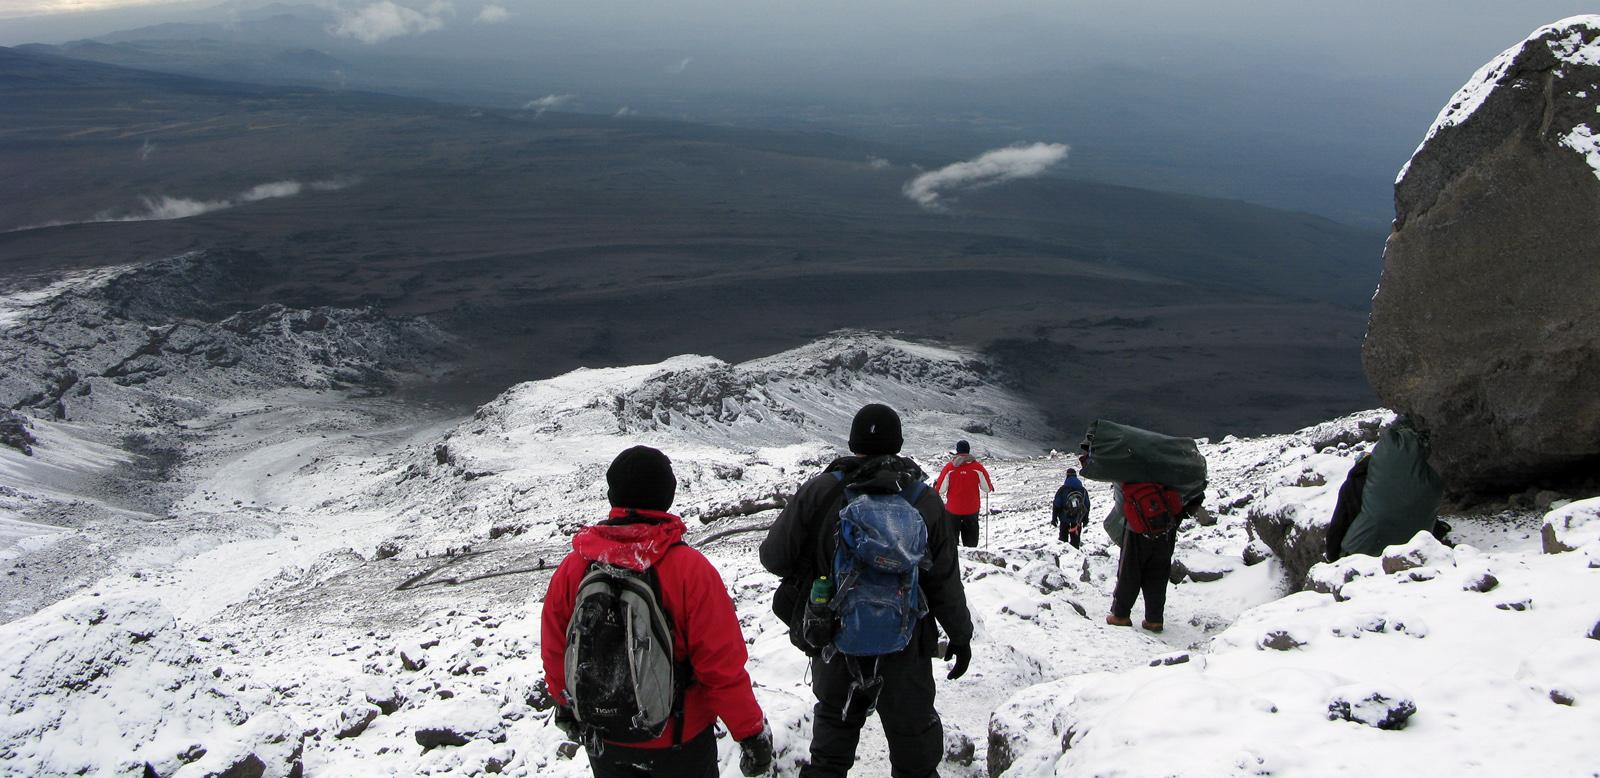 Summit on the Summit Water.org Mount Kilimanjaro Global Water Crisis